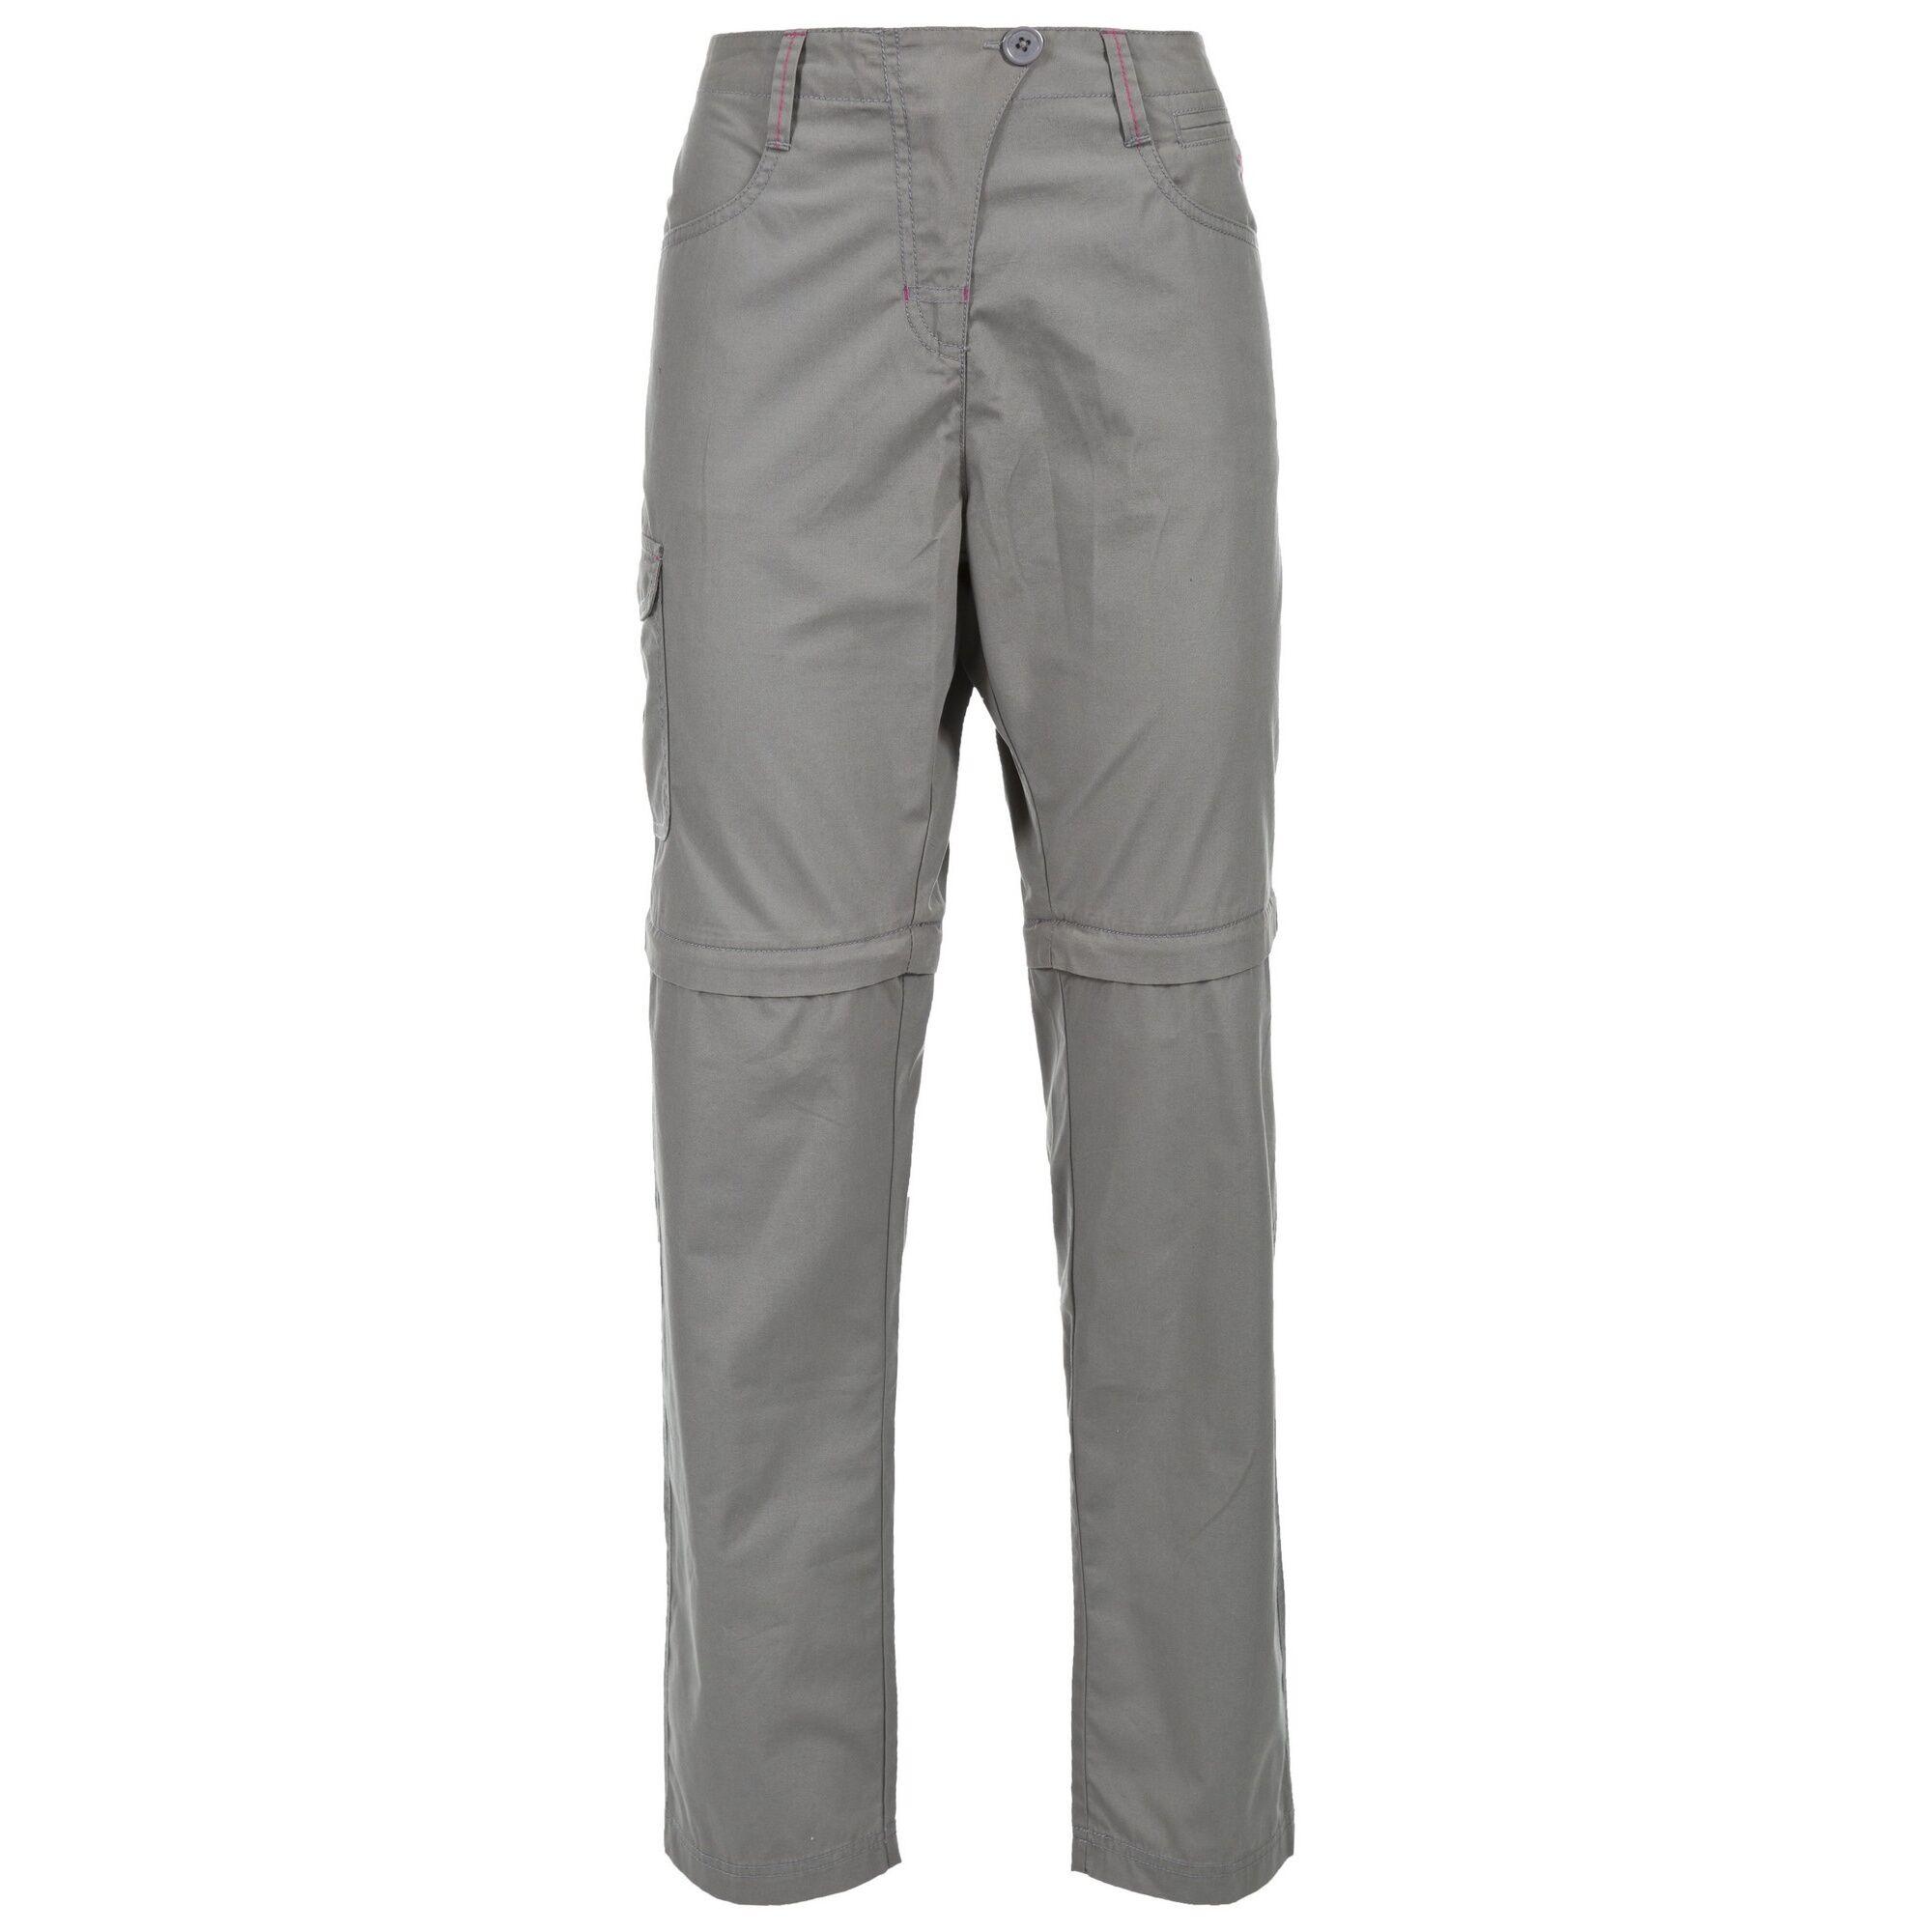 Trespass Rambler - Pantalon De Randonnée Convertible - Femme (Gris tempête) - UTTP3592